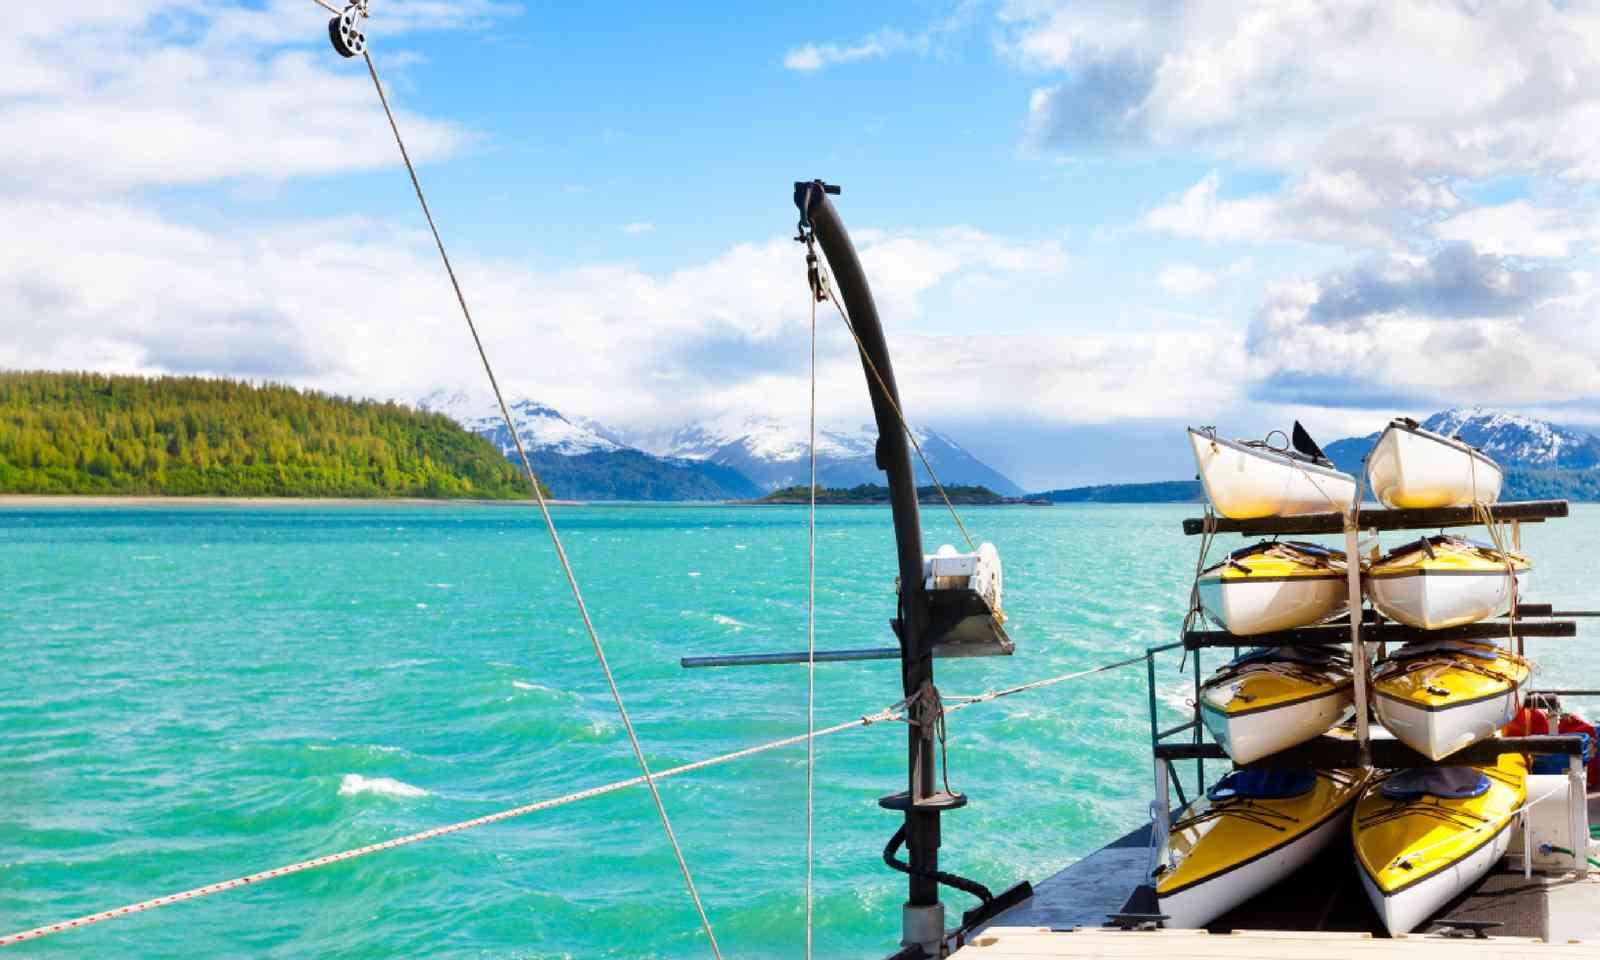 Stacked kayaks in Alaska (Shutterstock)